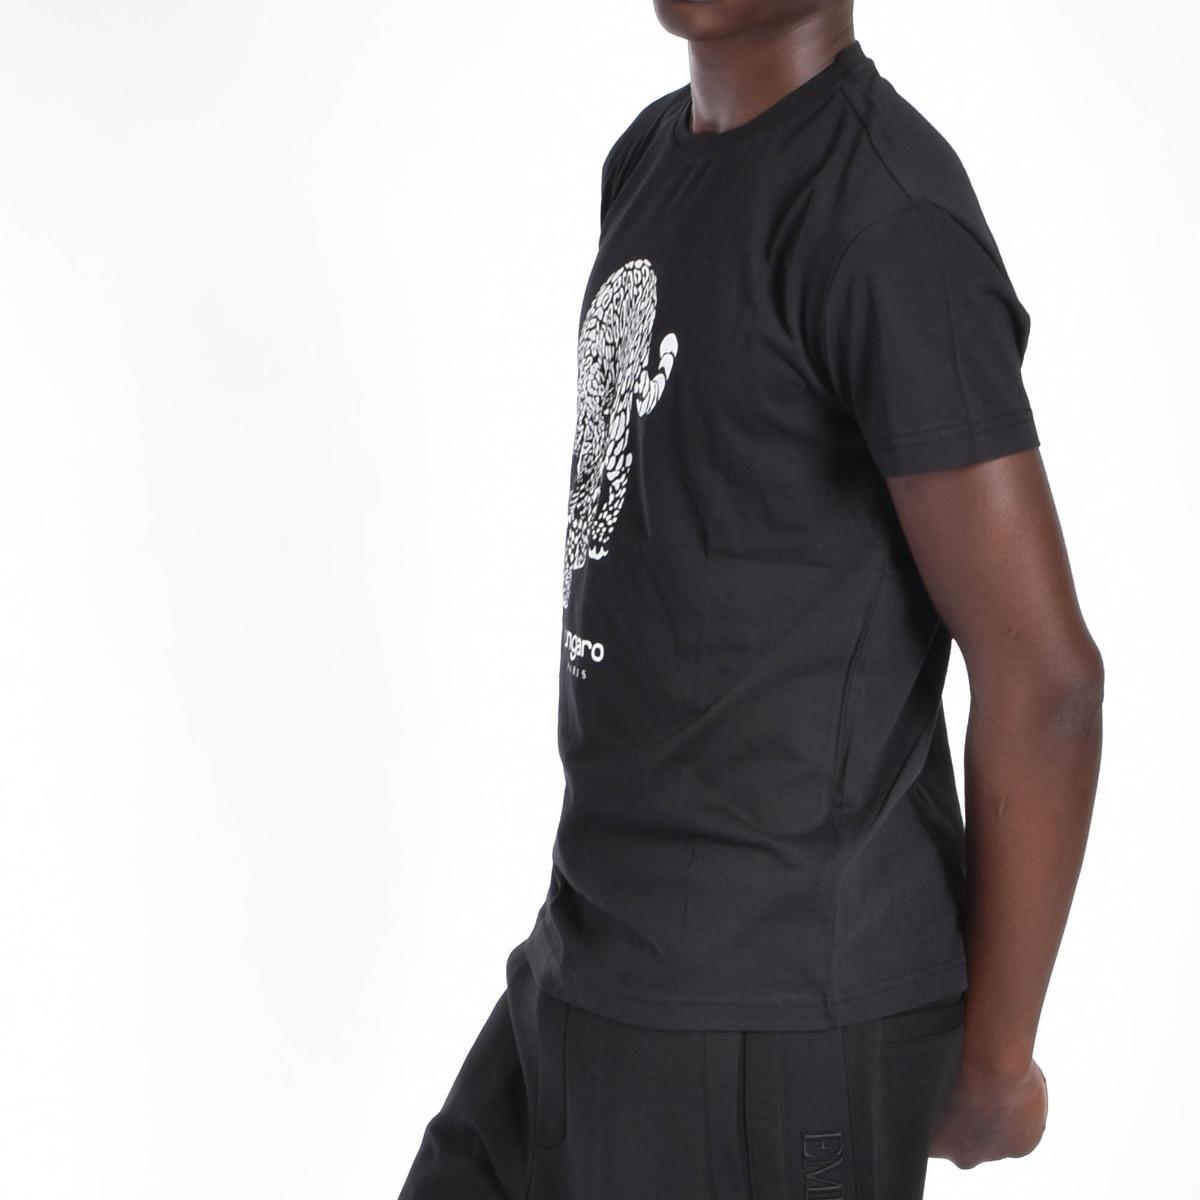 T-shirt con Giaguaro - Nera